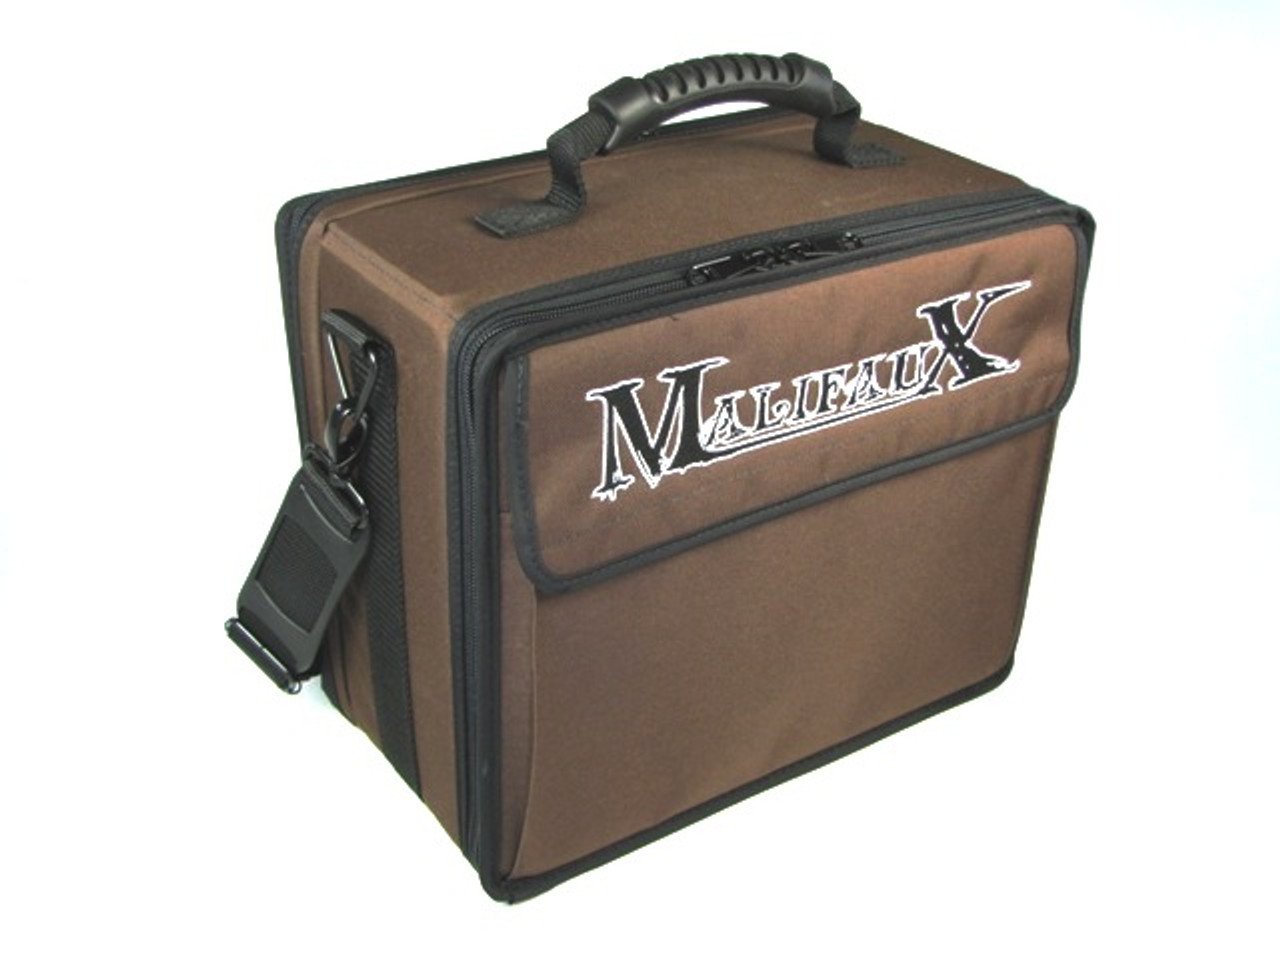 Malifaux Bag Standard Load Out Battle Foam Shield bag (pluck foam load out). malifaux bag standard load out